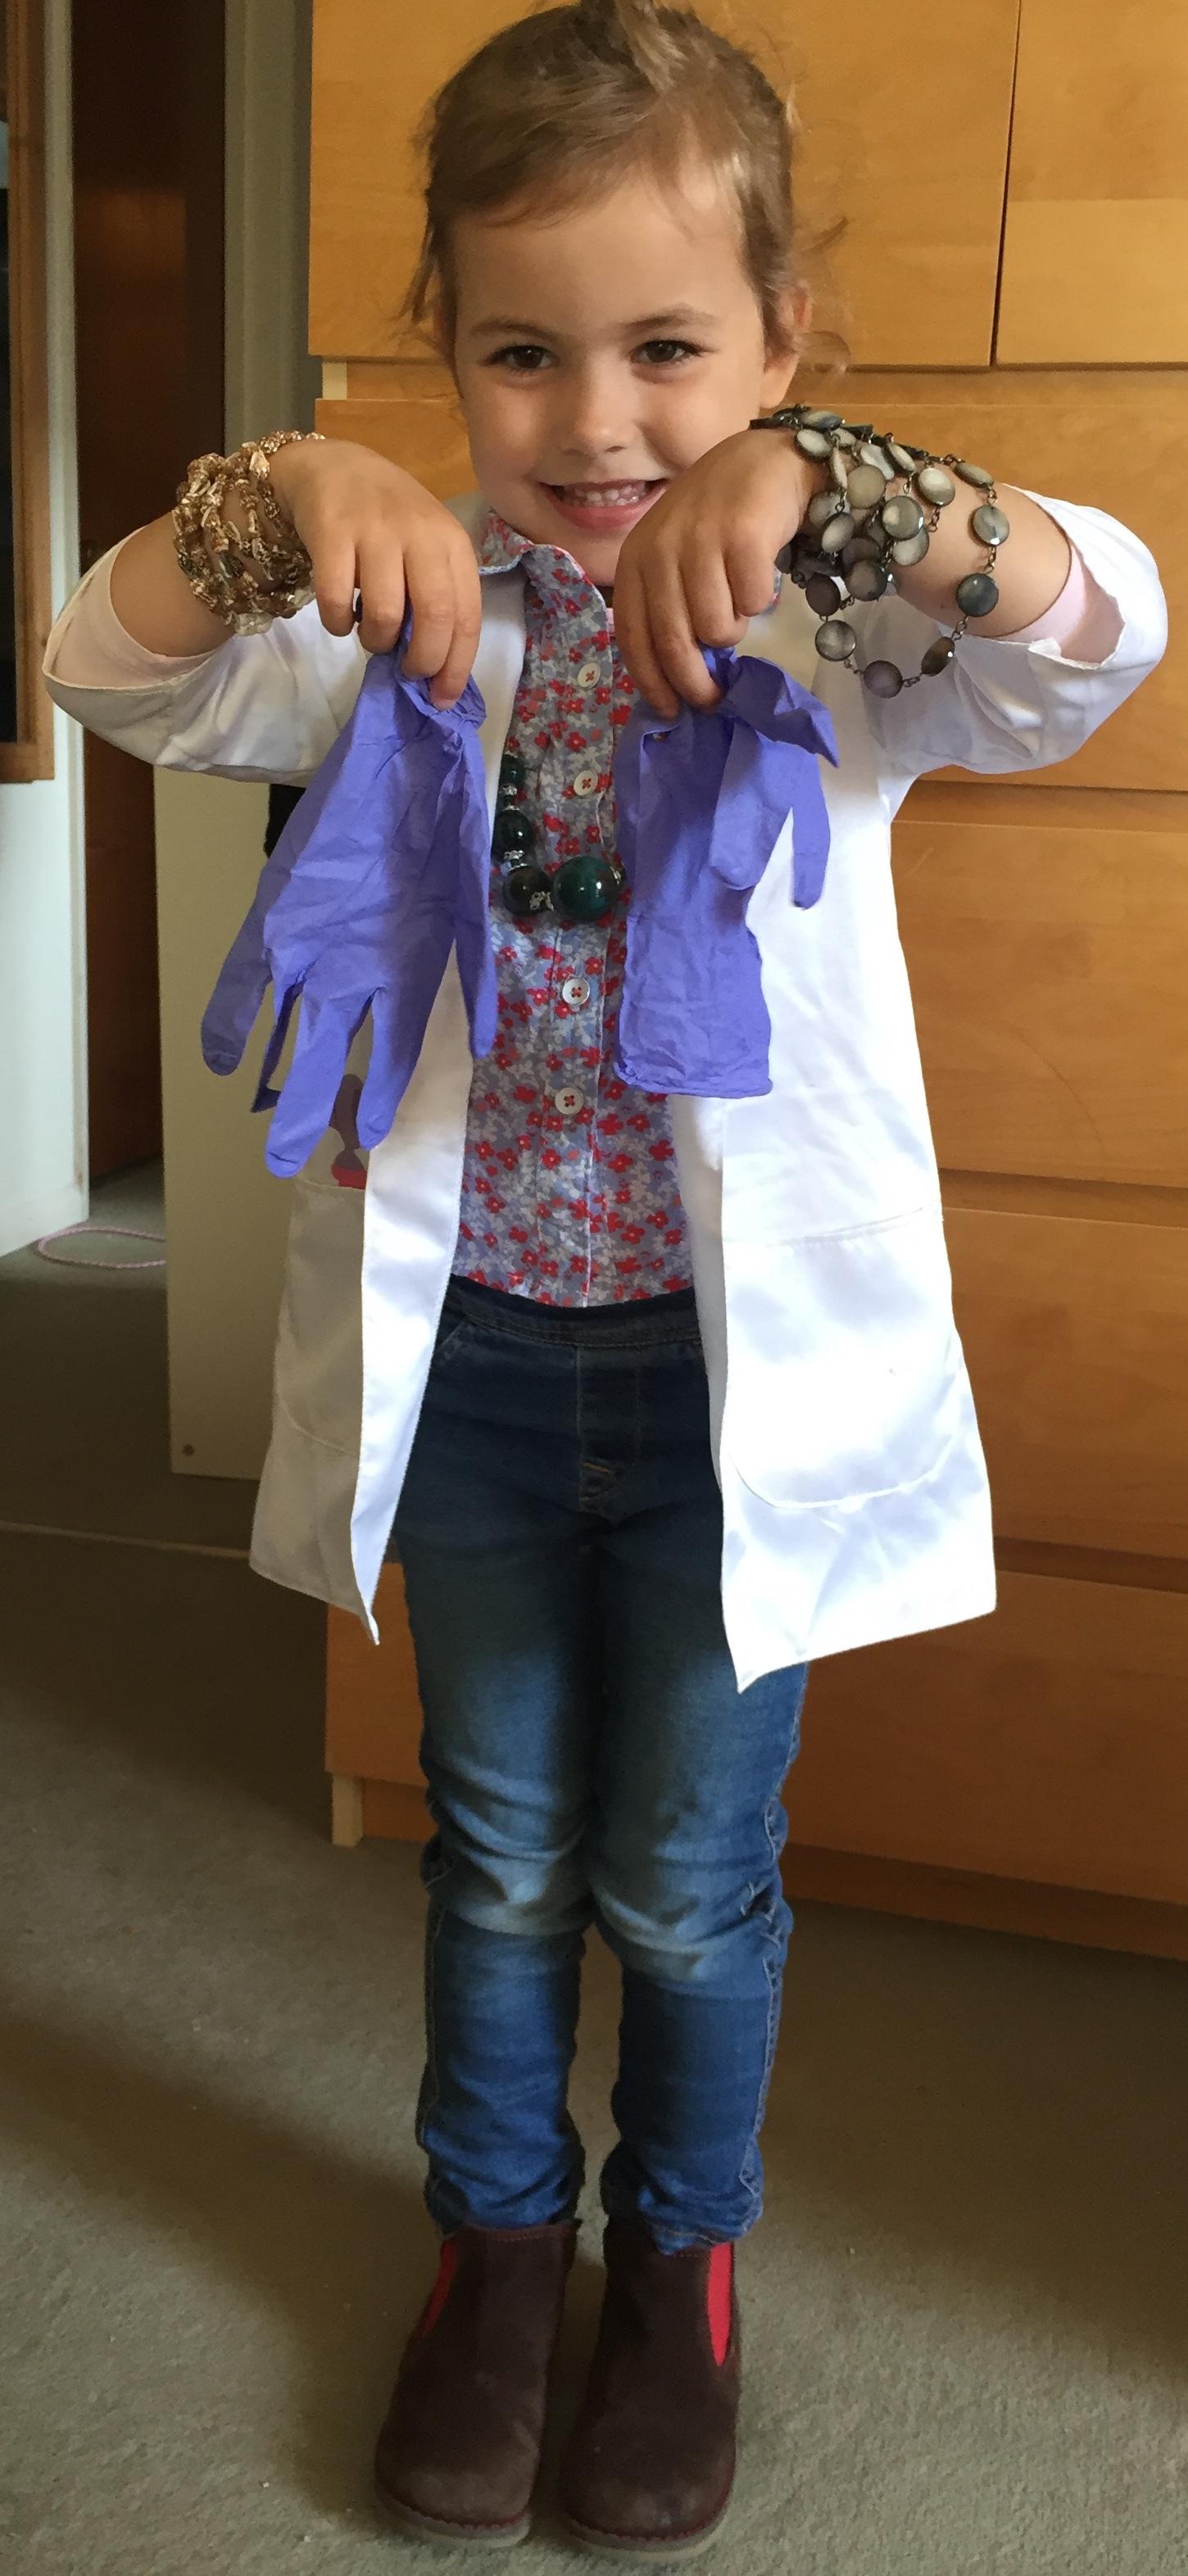 Clara Simoes dressed as a scientist for 'Superhero Day'